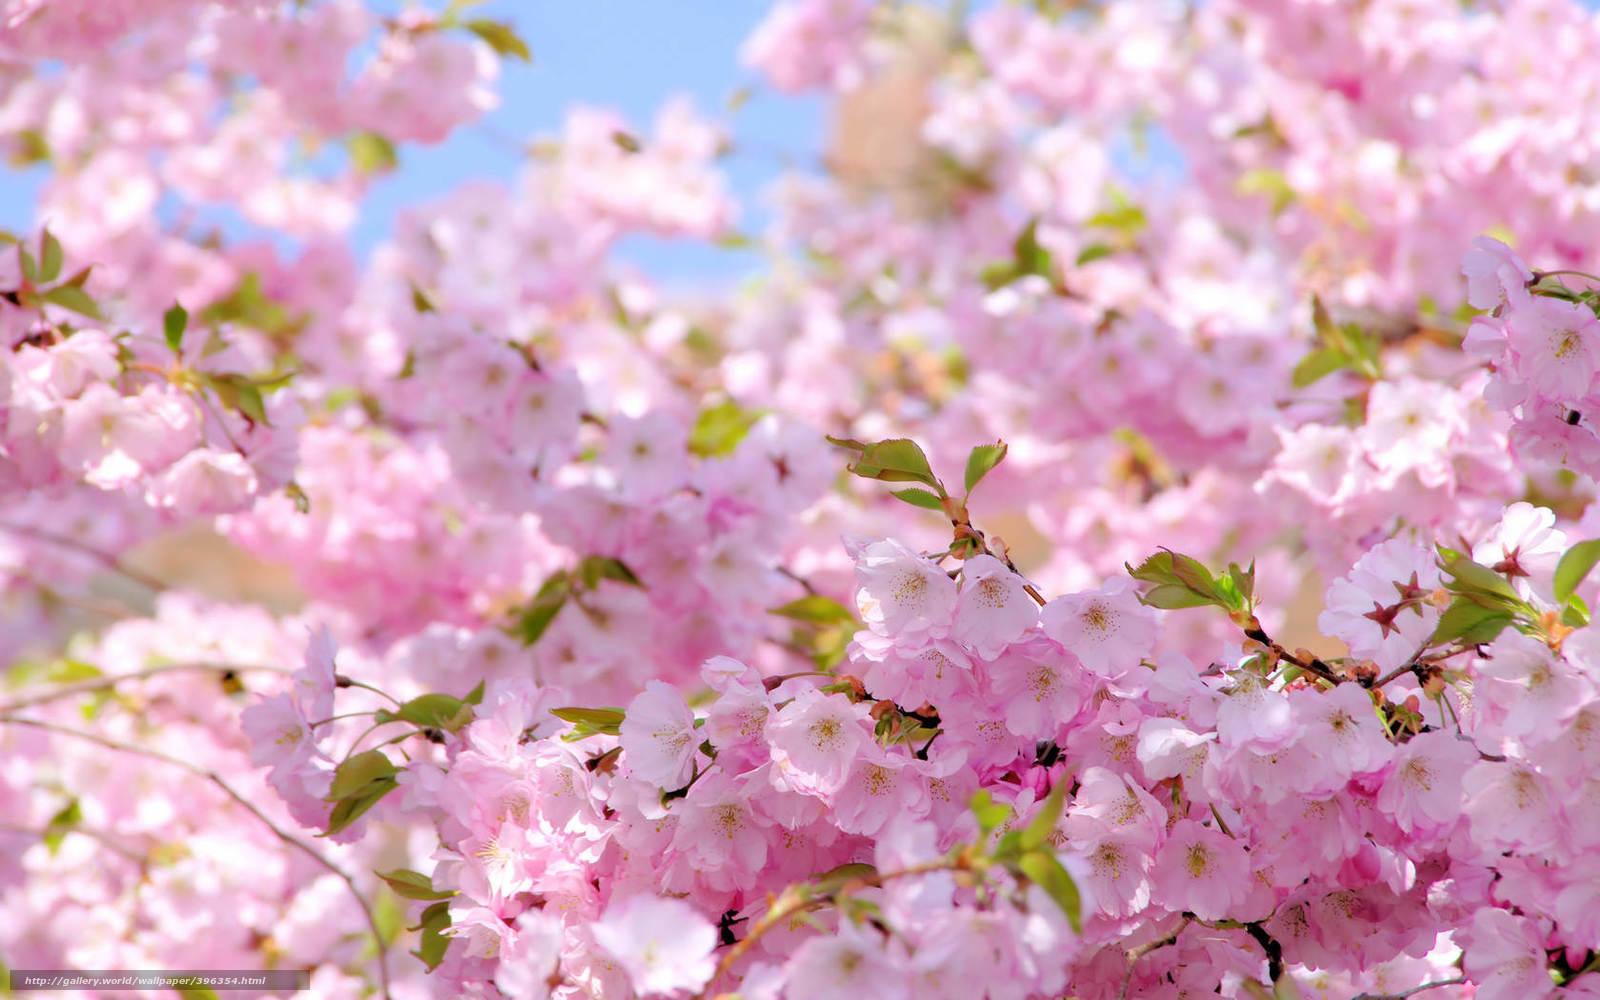 tlcharger fond d 39 ecran printemps soleil fleurir sakura fonds d 39 ecran gratuits pour votre. Black Bedroom Furniture Sets. Home Design Ideas